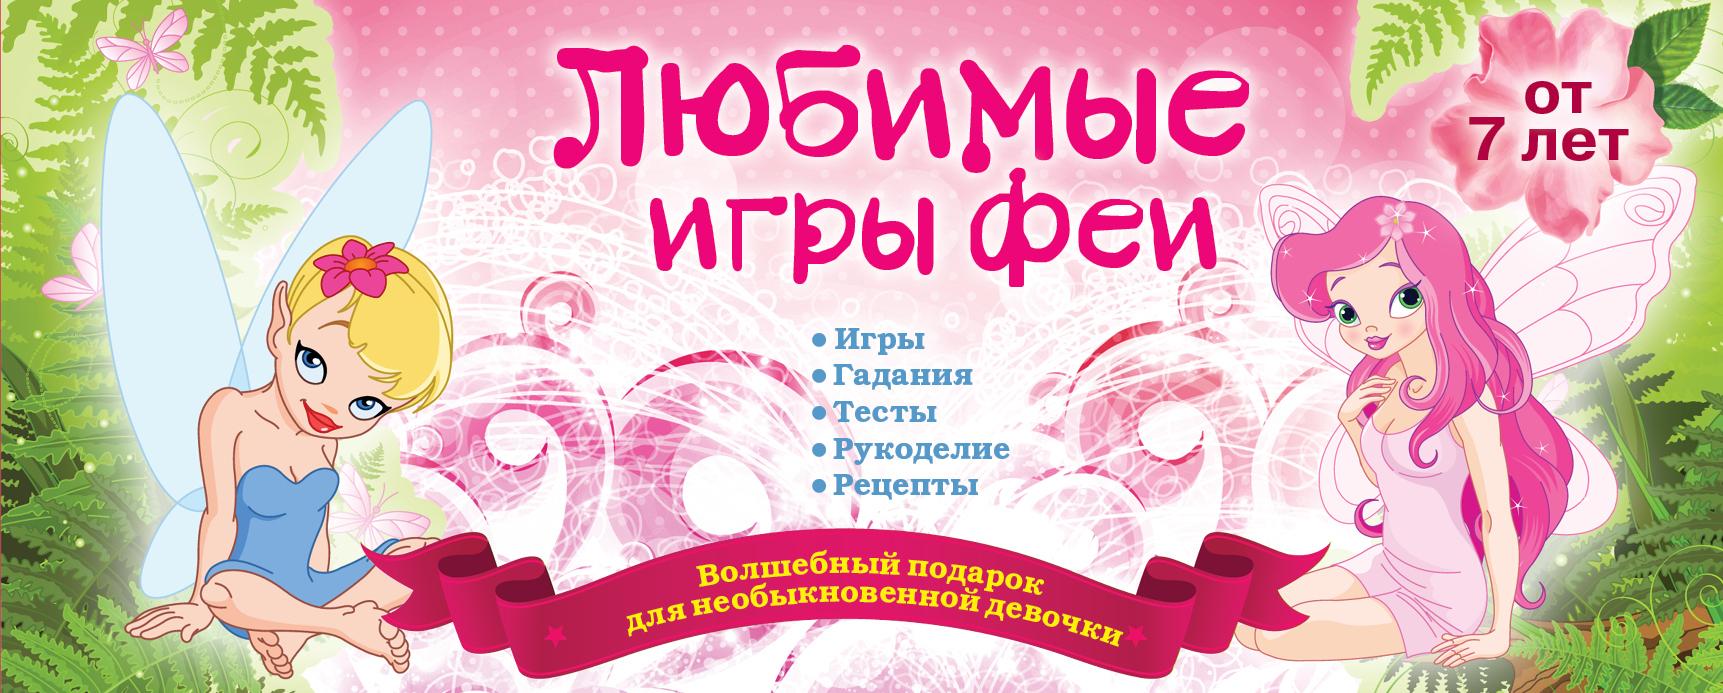 Ирина Парфенова Любимые игры феи любимые игры феи